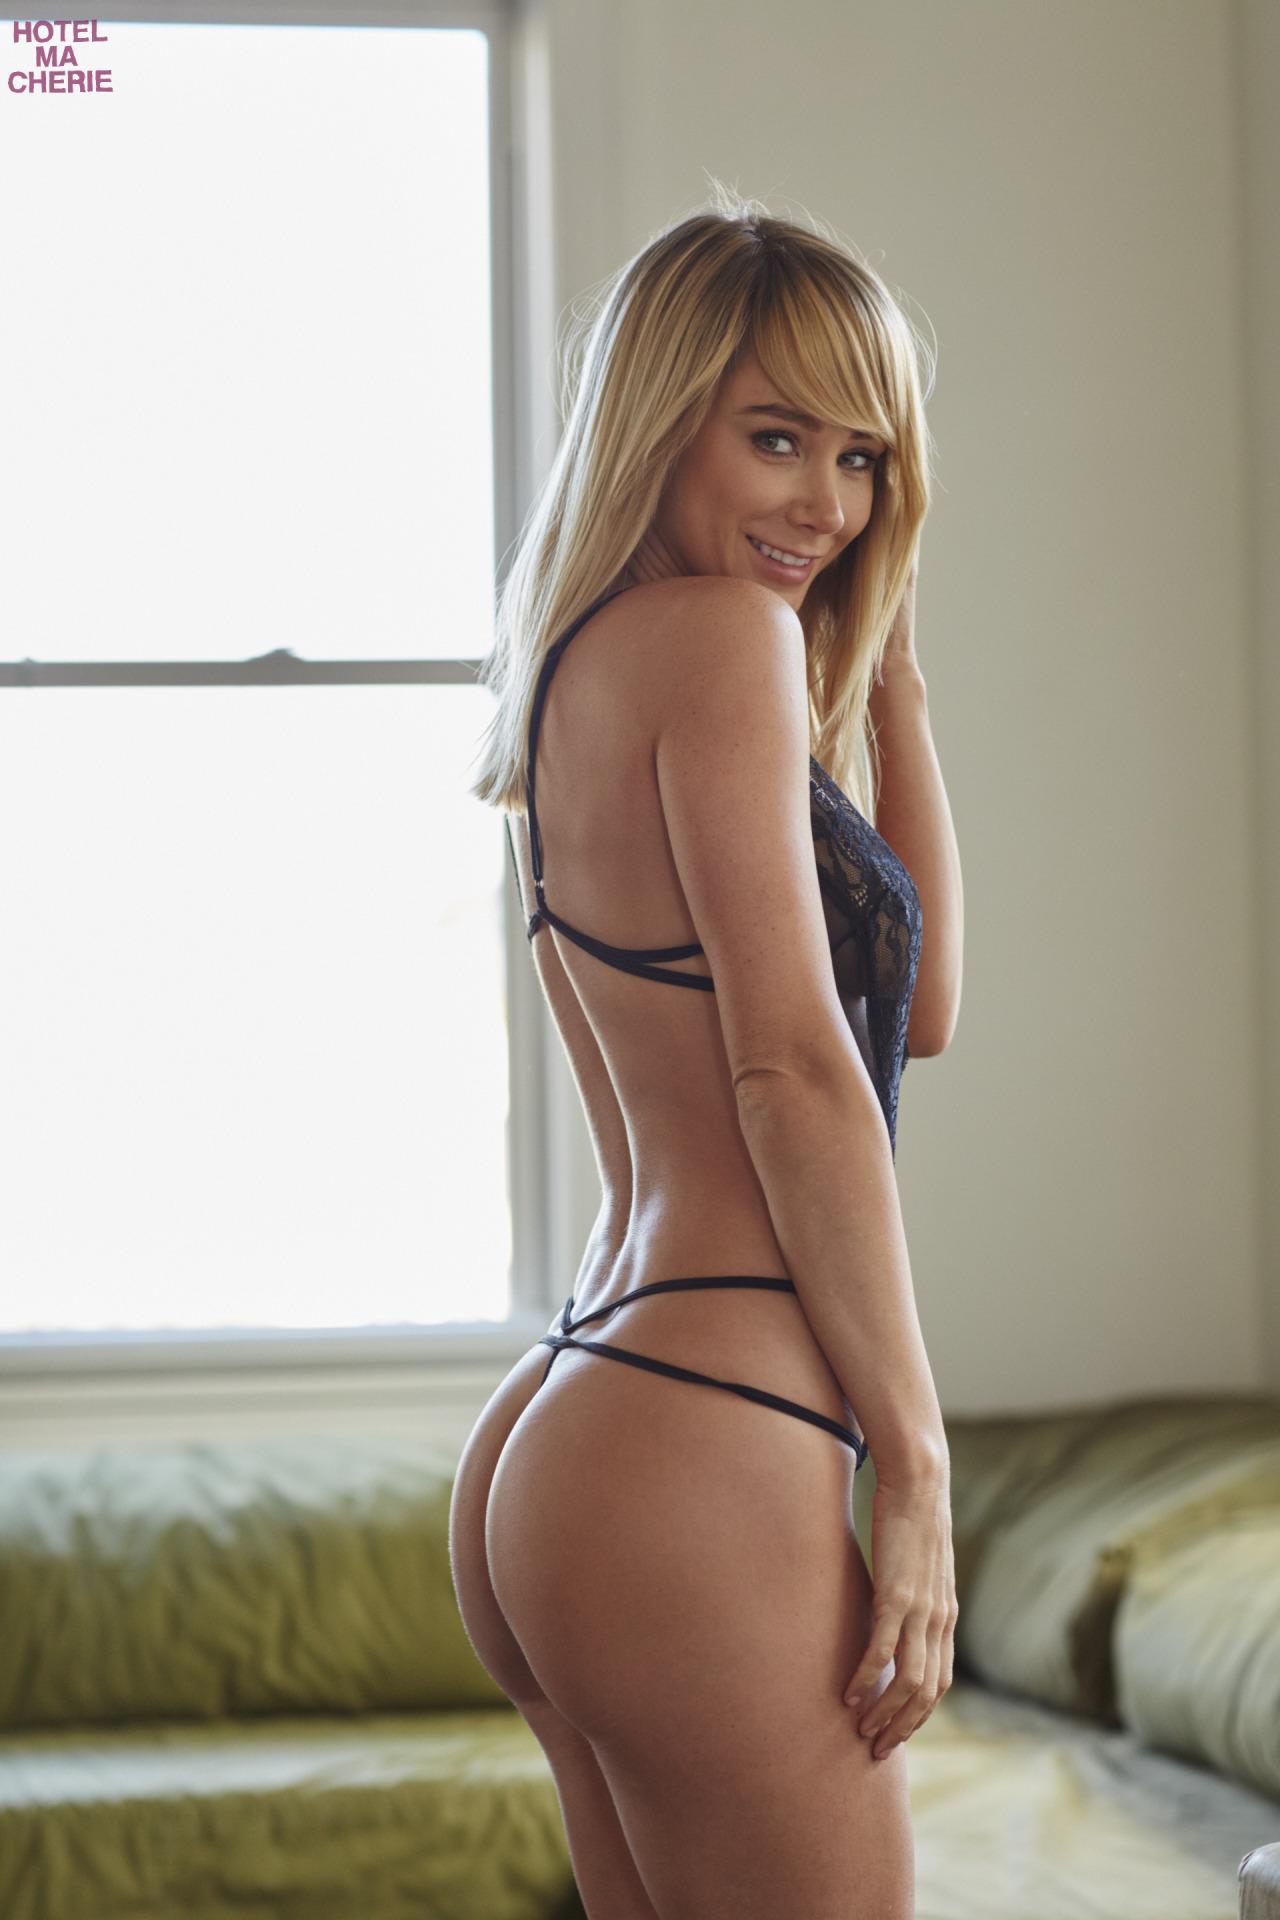 Nude Pics Of Sara Underwood 26